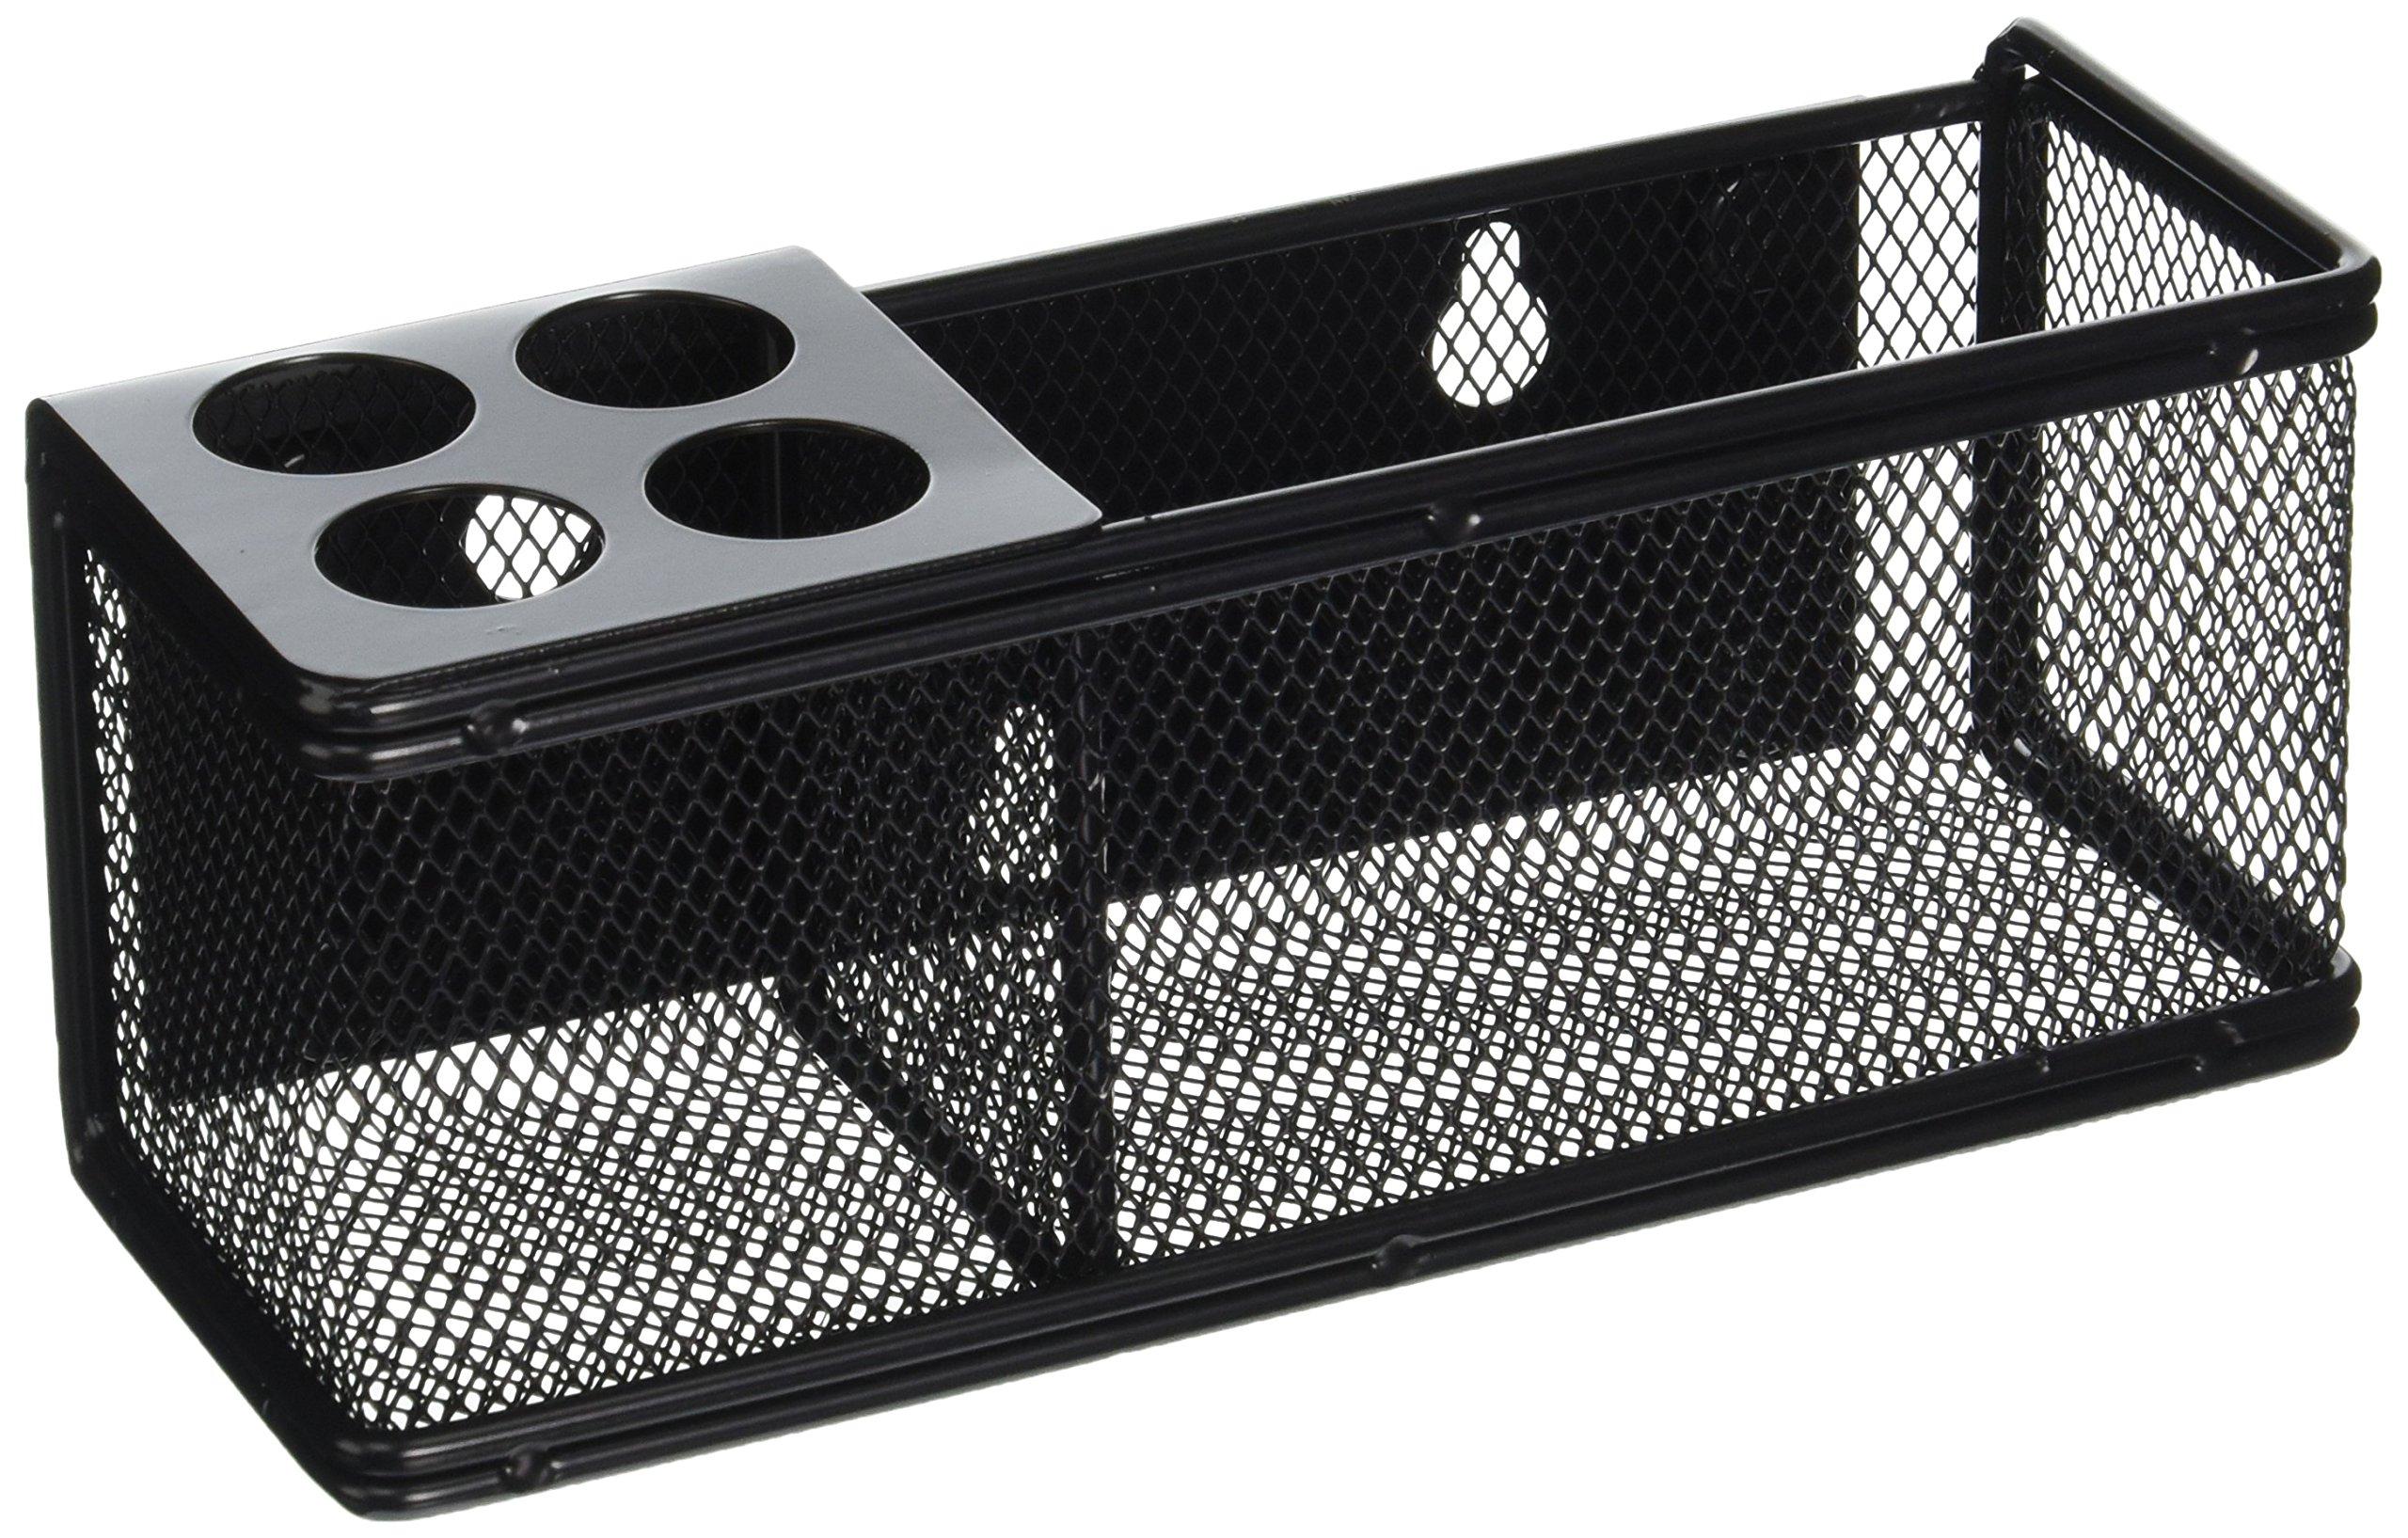 Safco Products 3612BL Onyx Mesh Marker Organizer Basket, Black